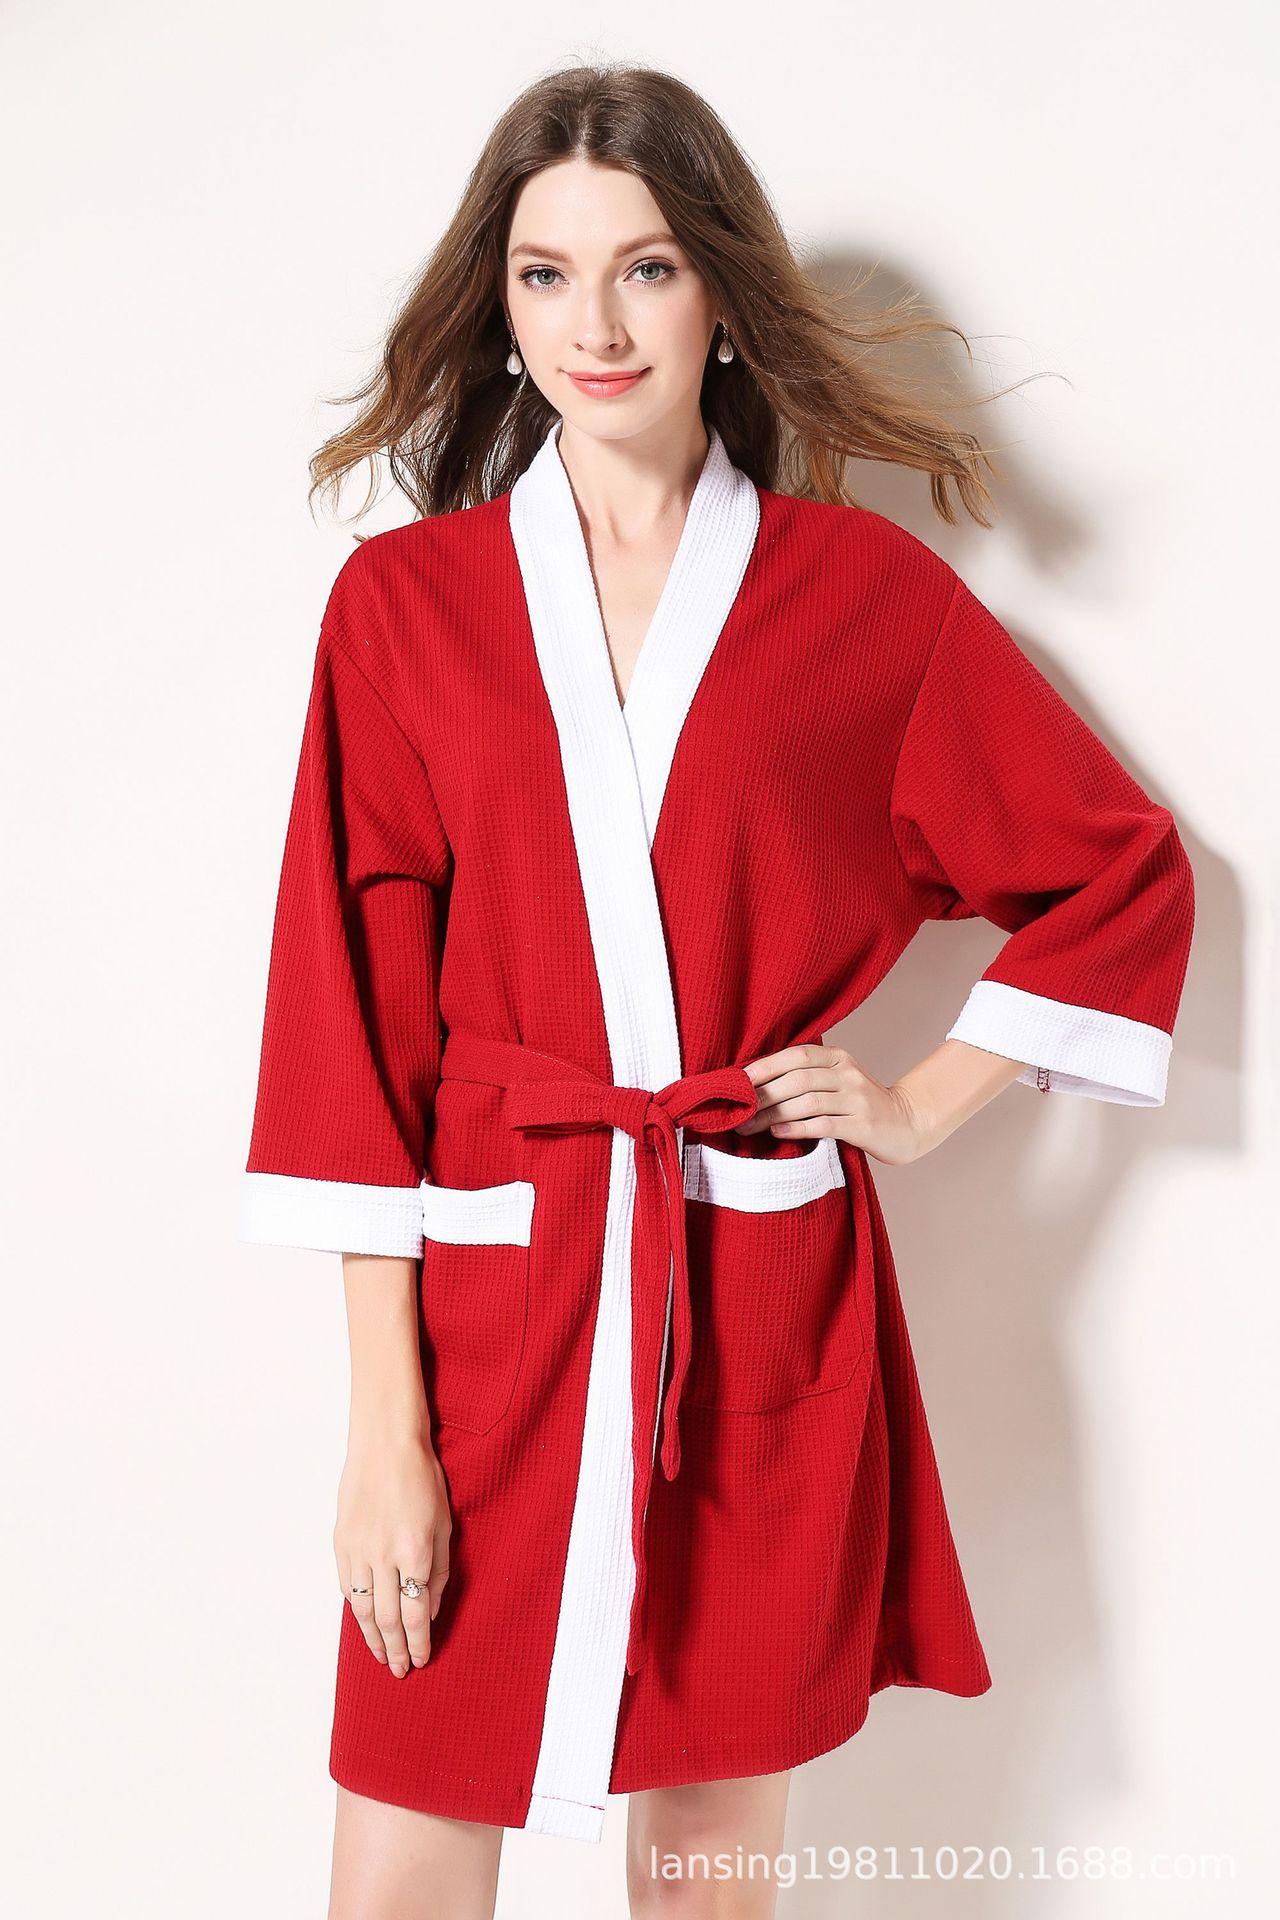 Five-star hotel  waffle robe bath robe bath robe batasde mujer  kimono robe sexy robe  ladies long gowns black  plus size women